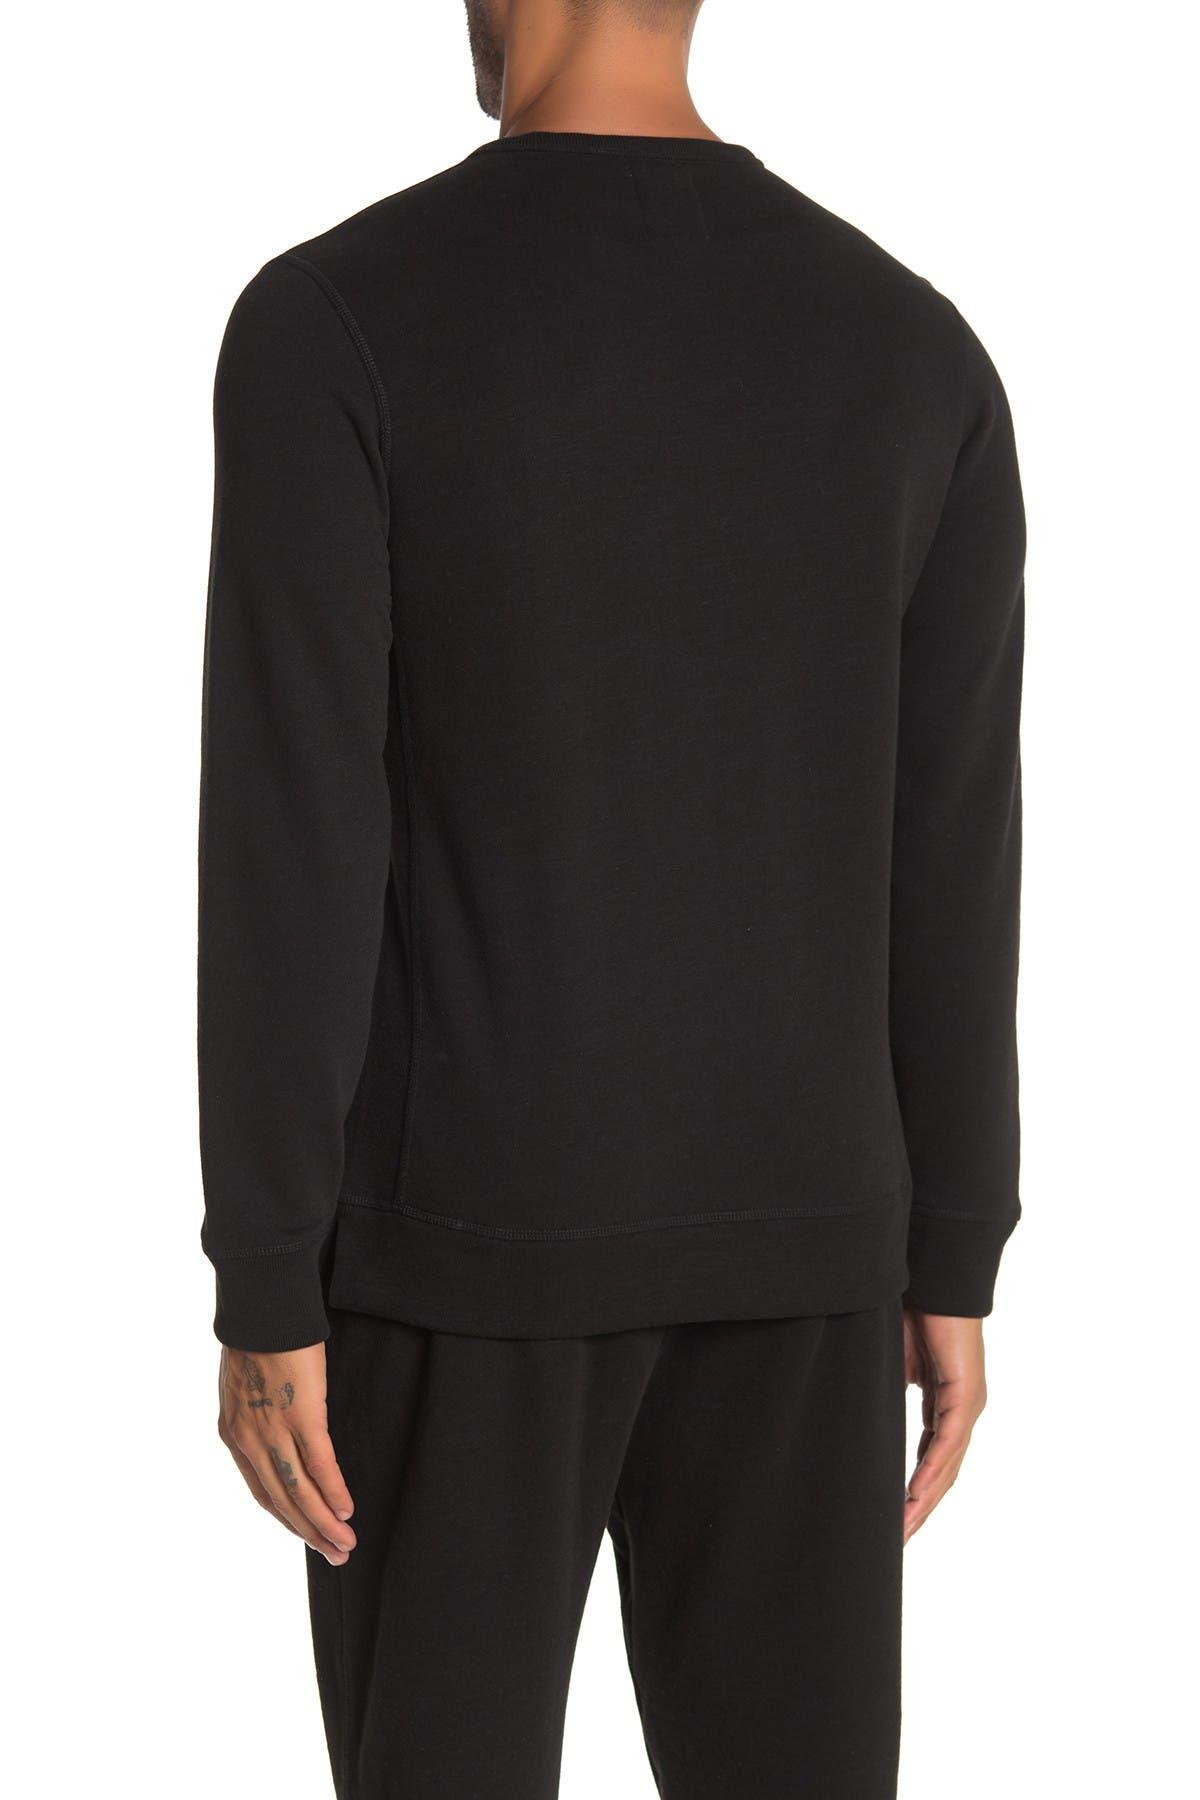 Image of JASON SCOTT Distressed Crew Neck Sweatshirt